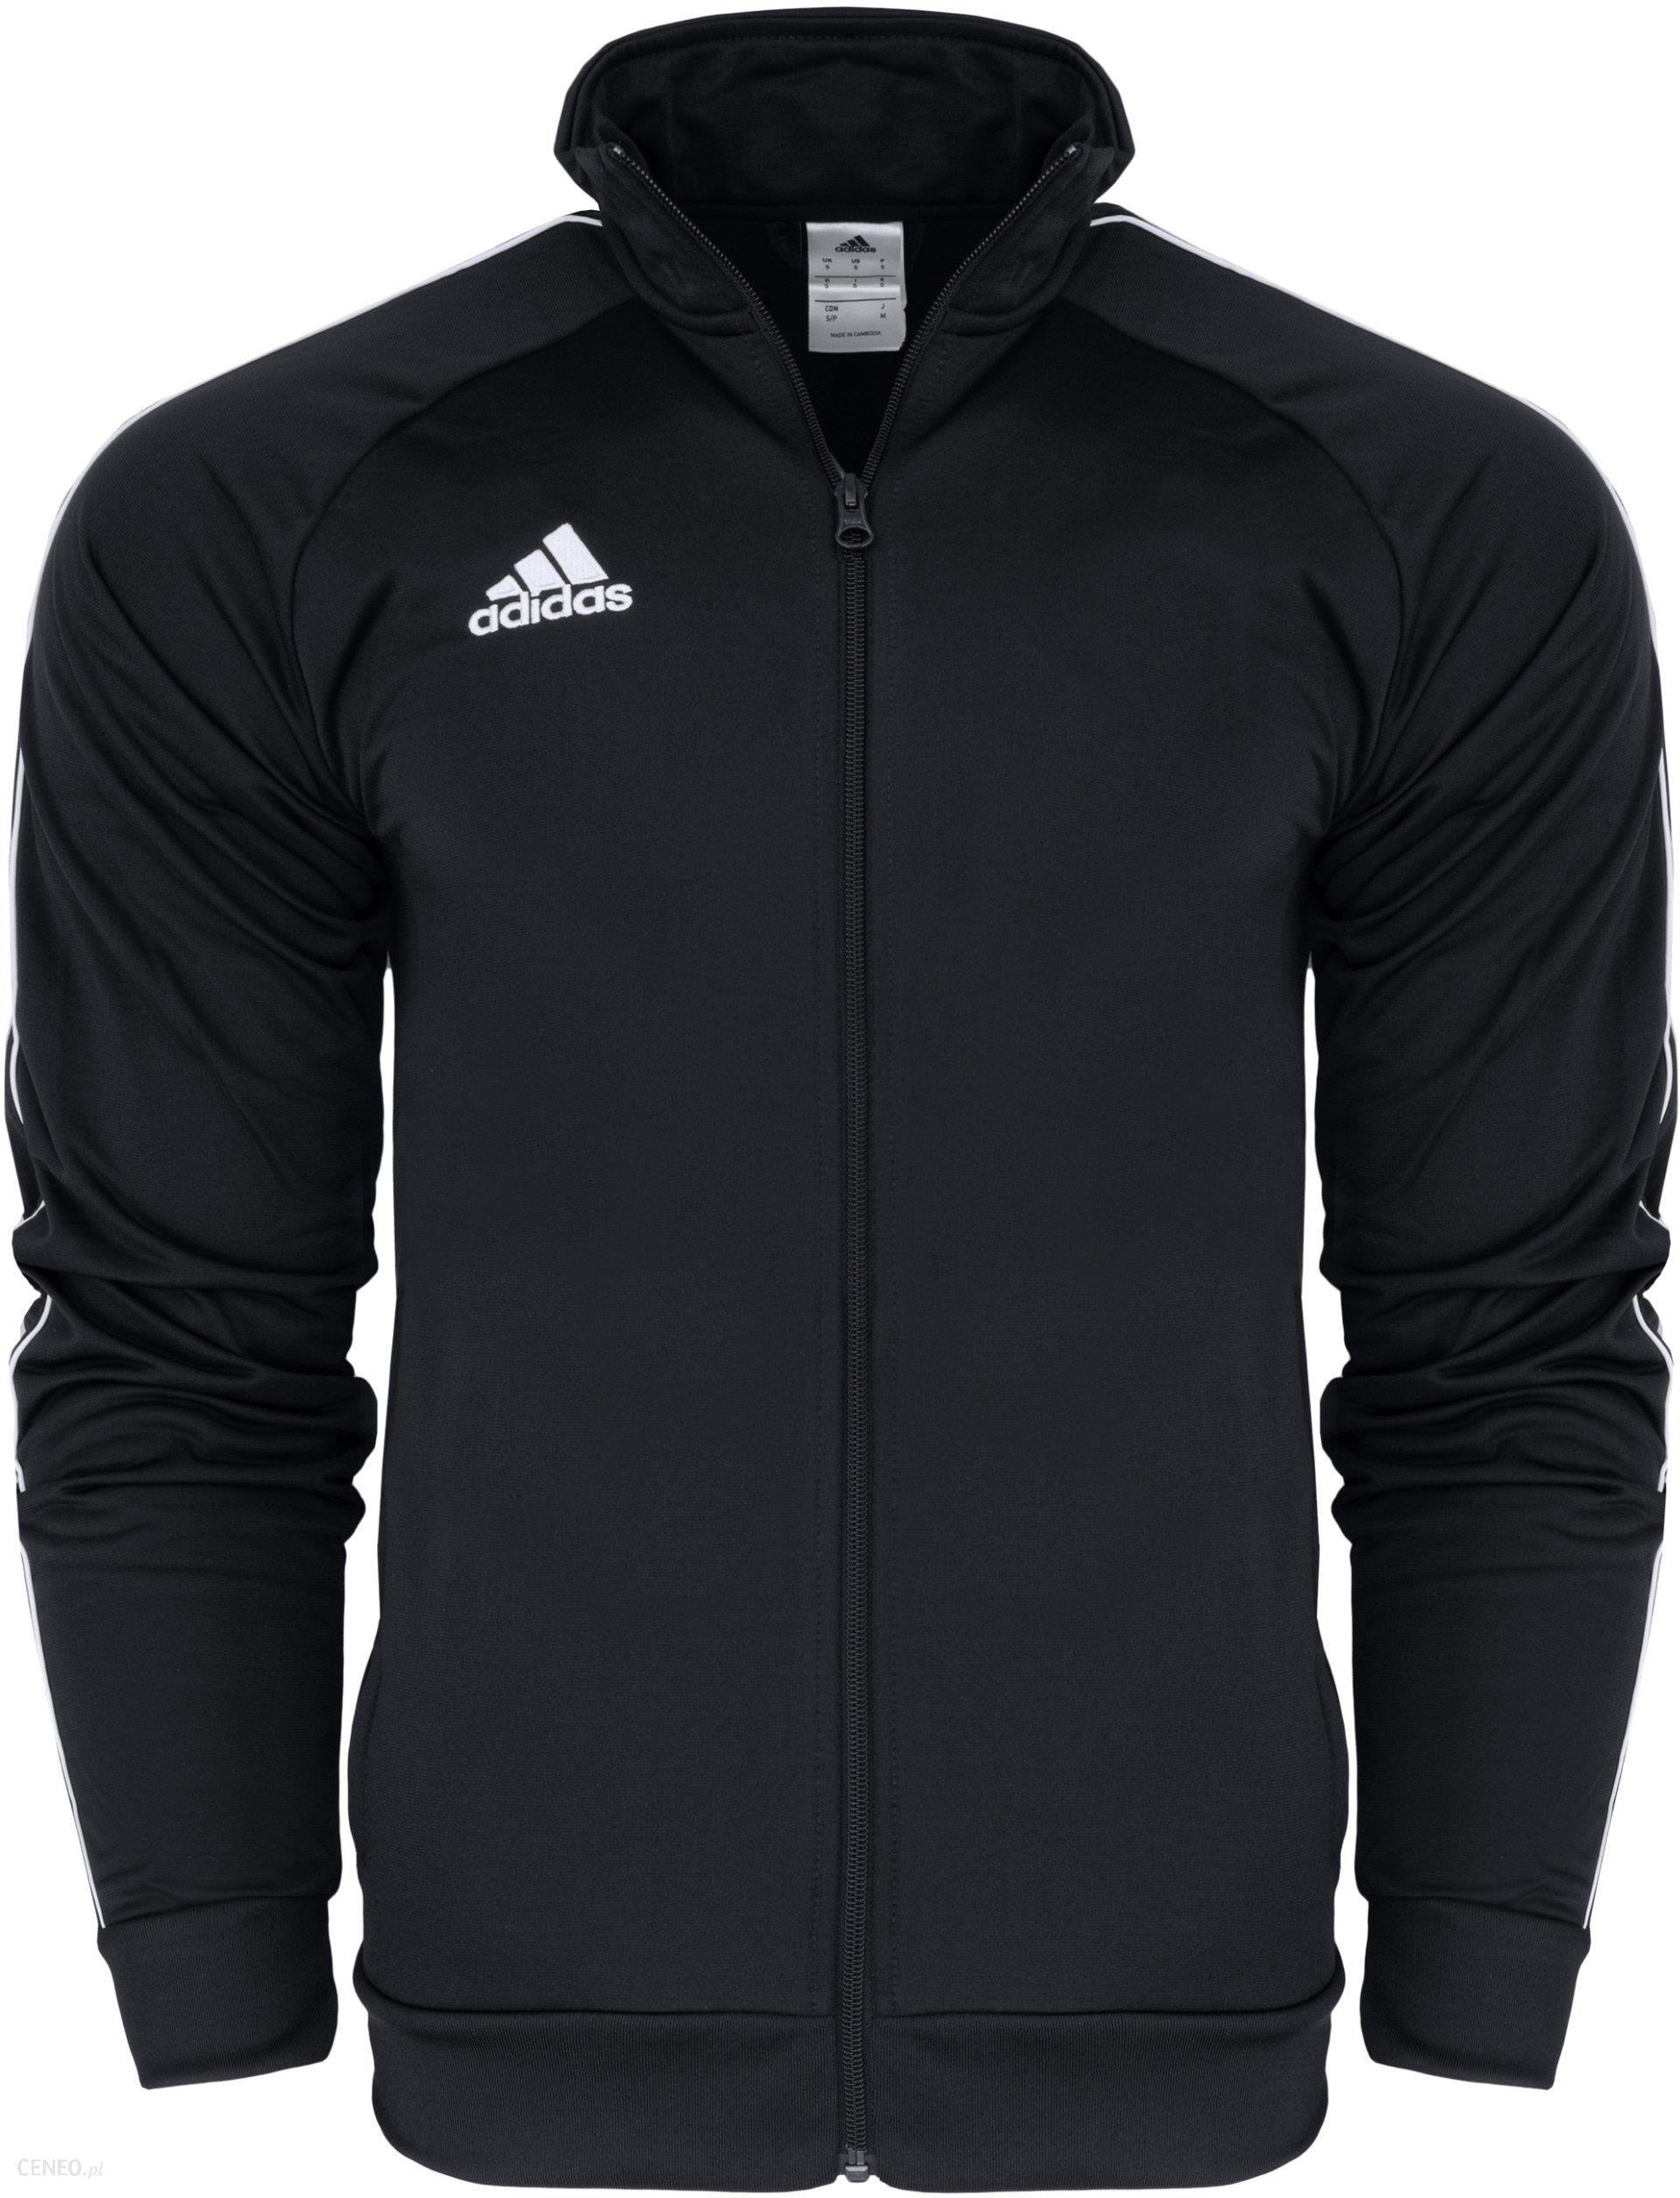 bluza męska adidas rozpinana z kapturem czarne